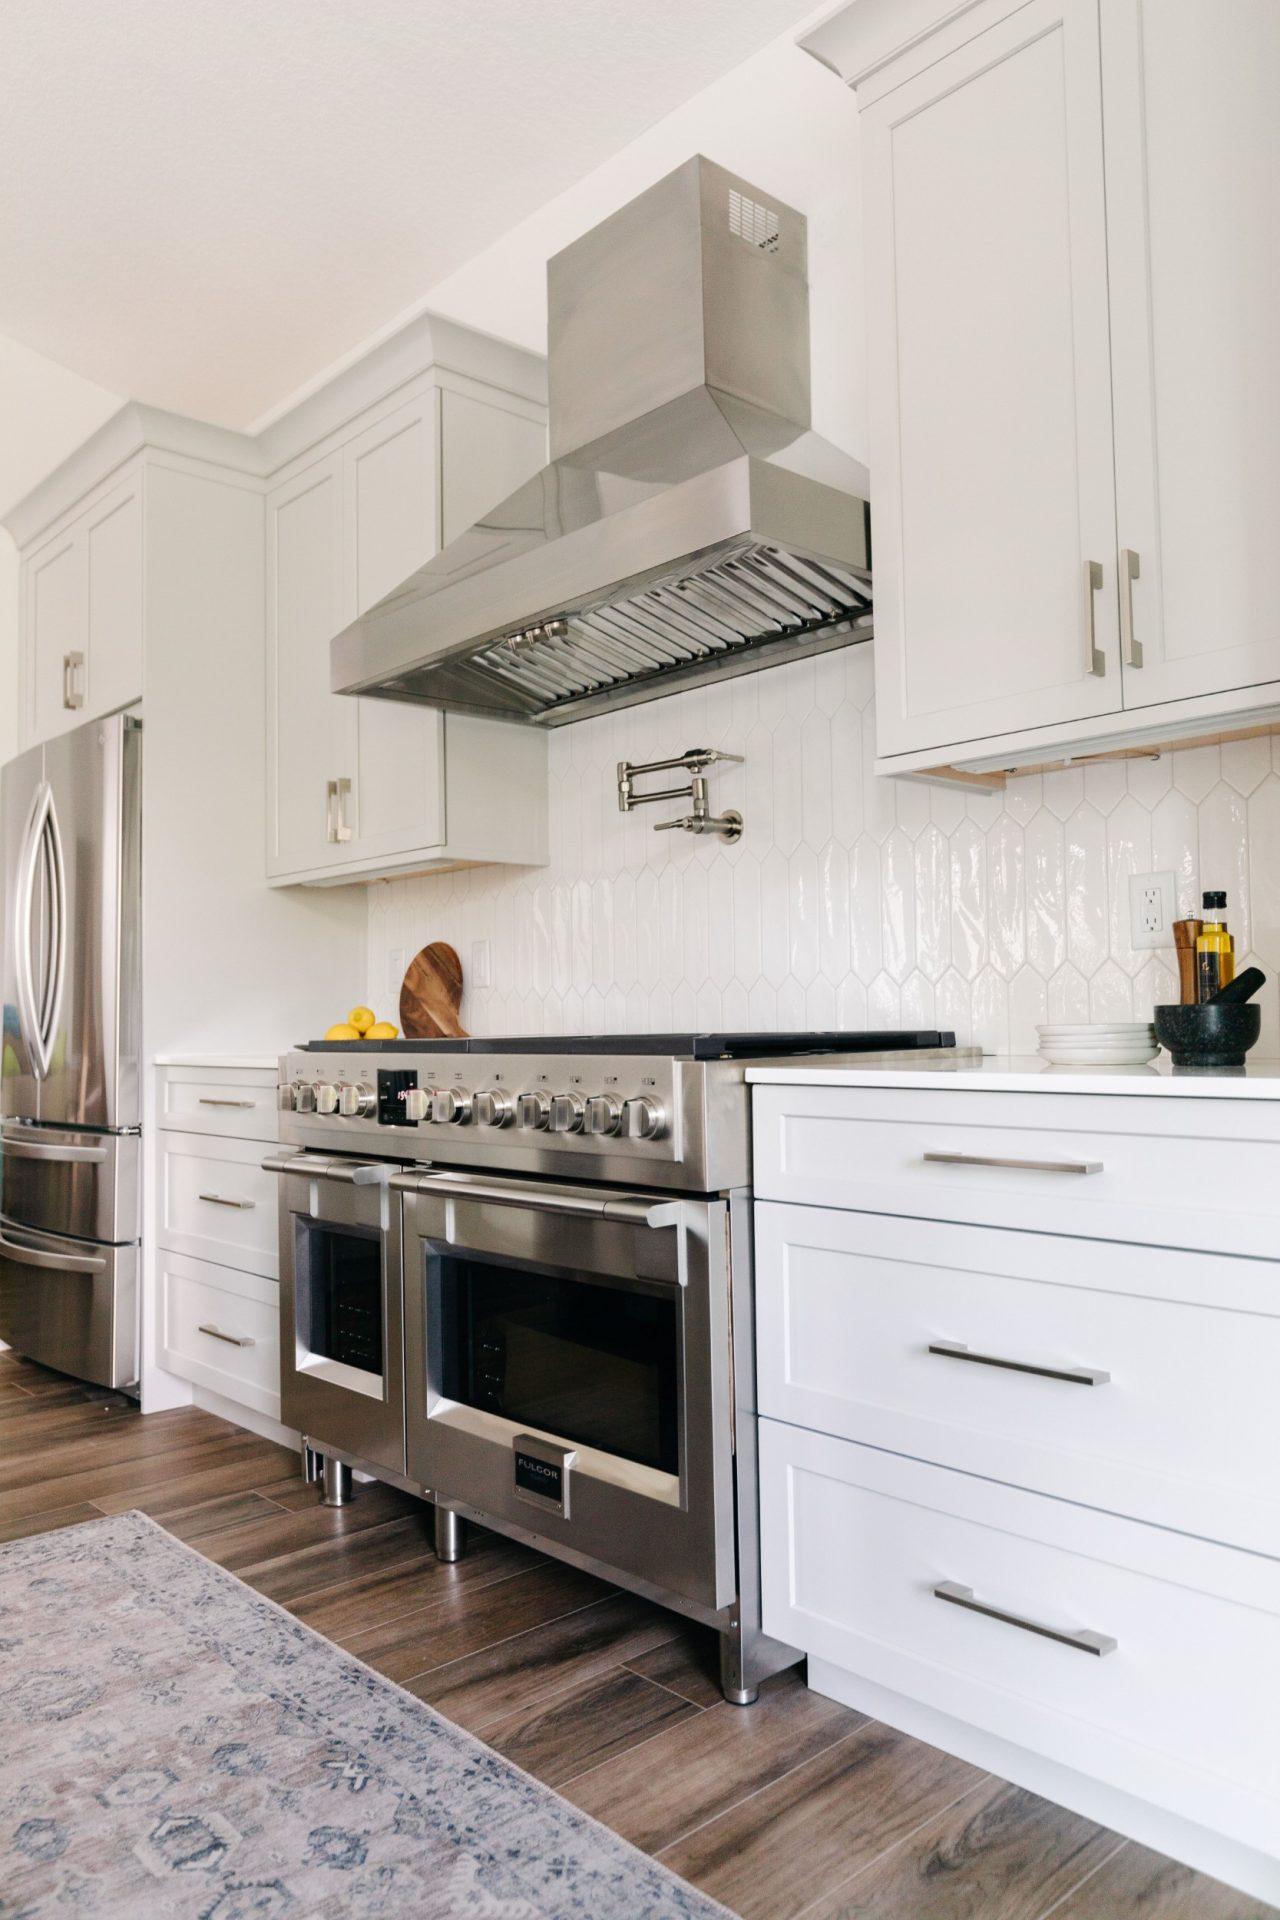 Wisper Bay | Kitchen Range